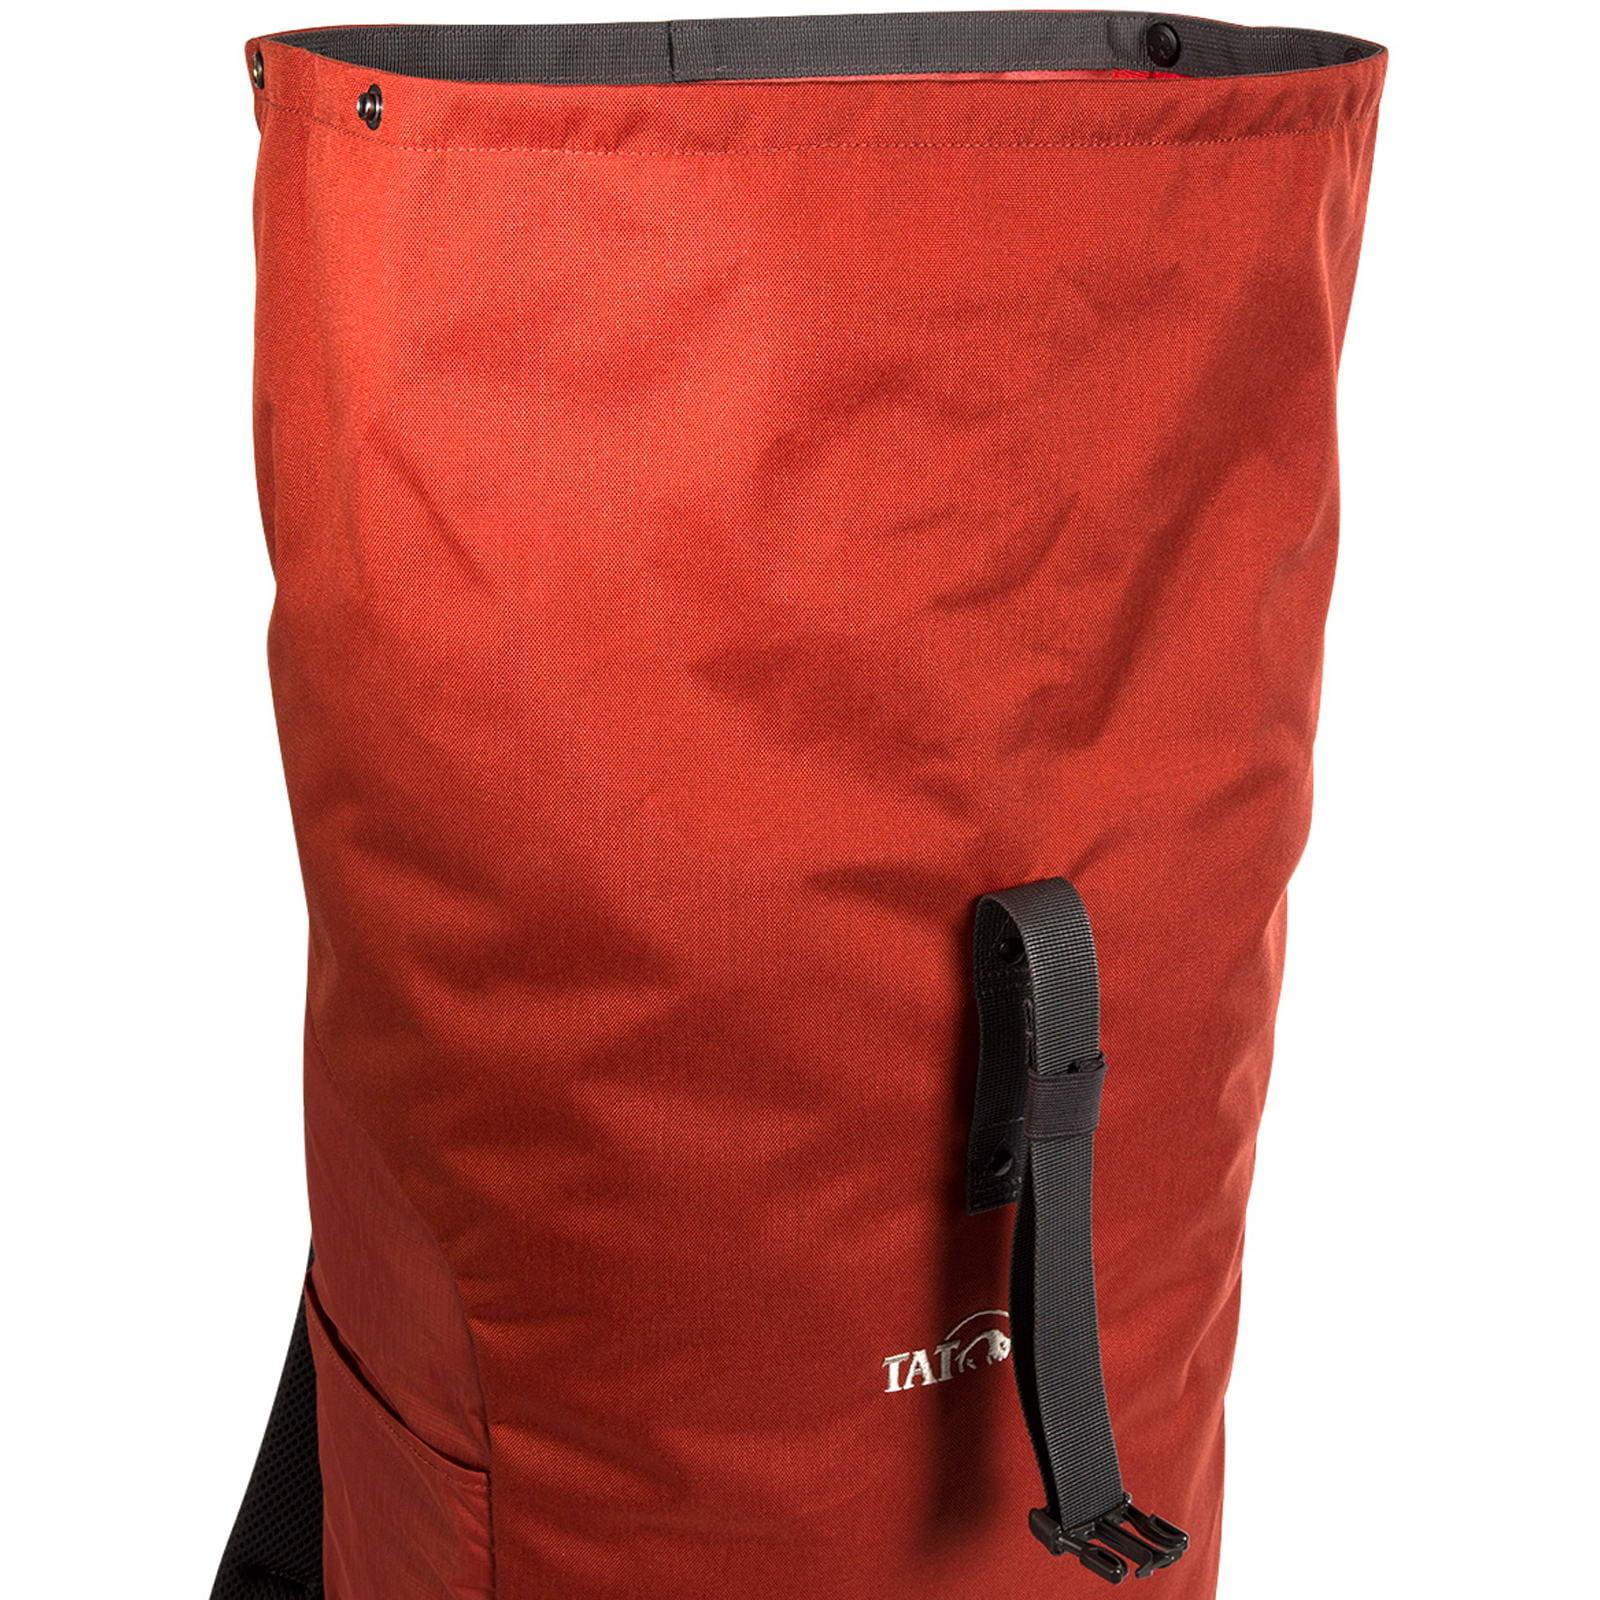 Tatonka Grip Rolltop Pack - Daypack redbrown - Bild 14